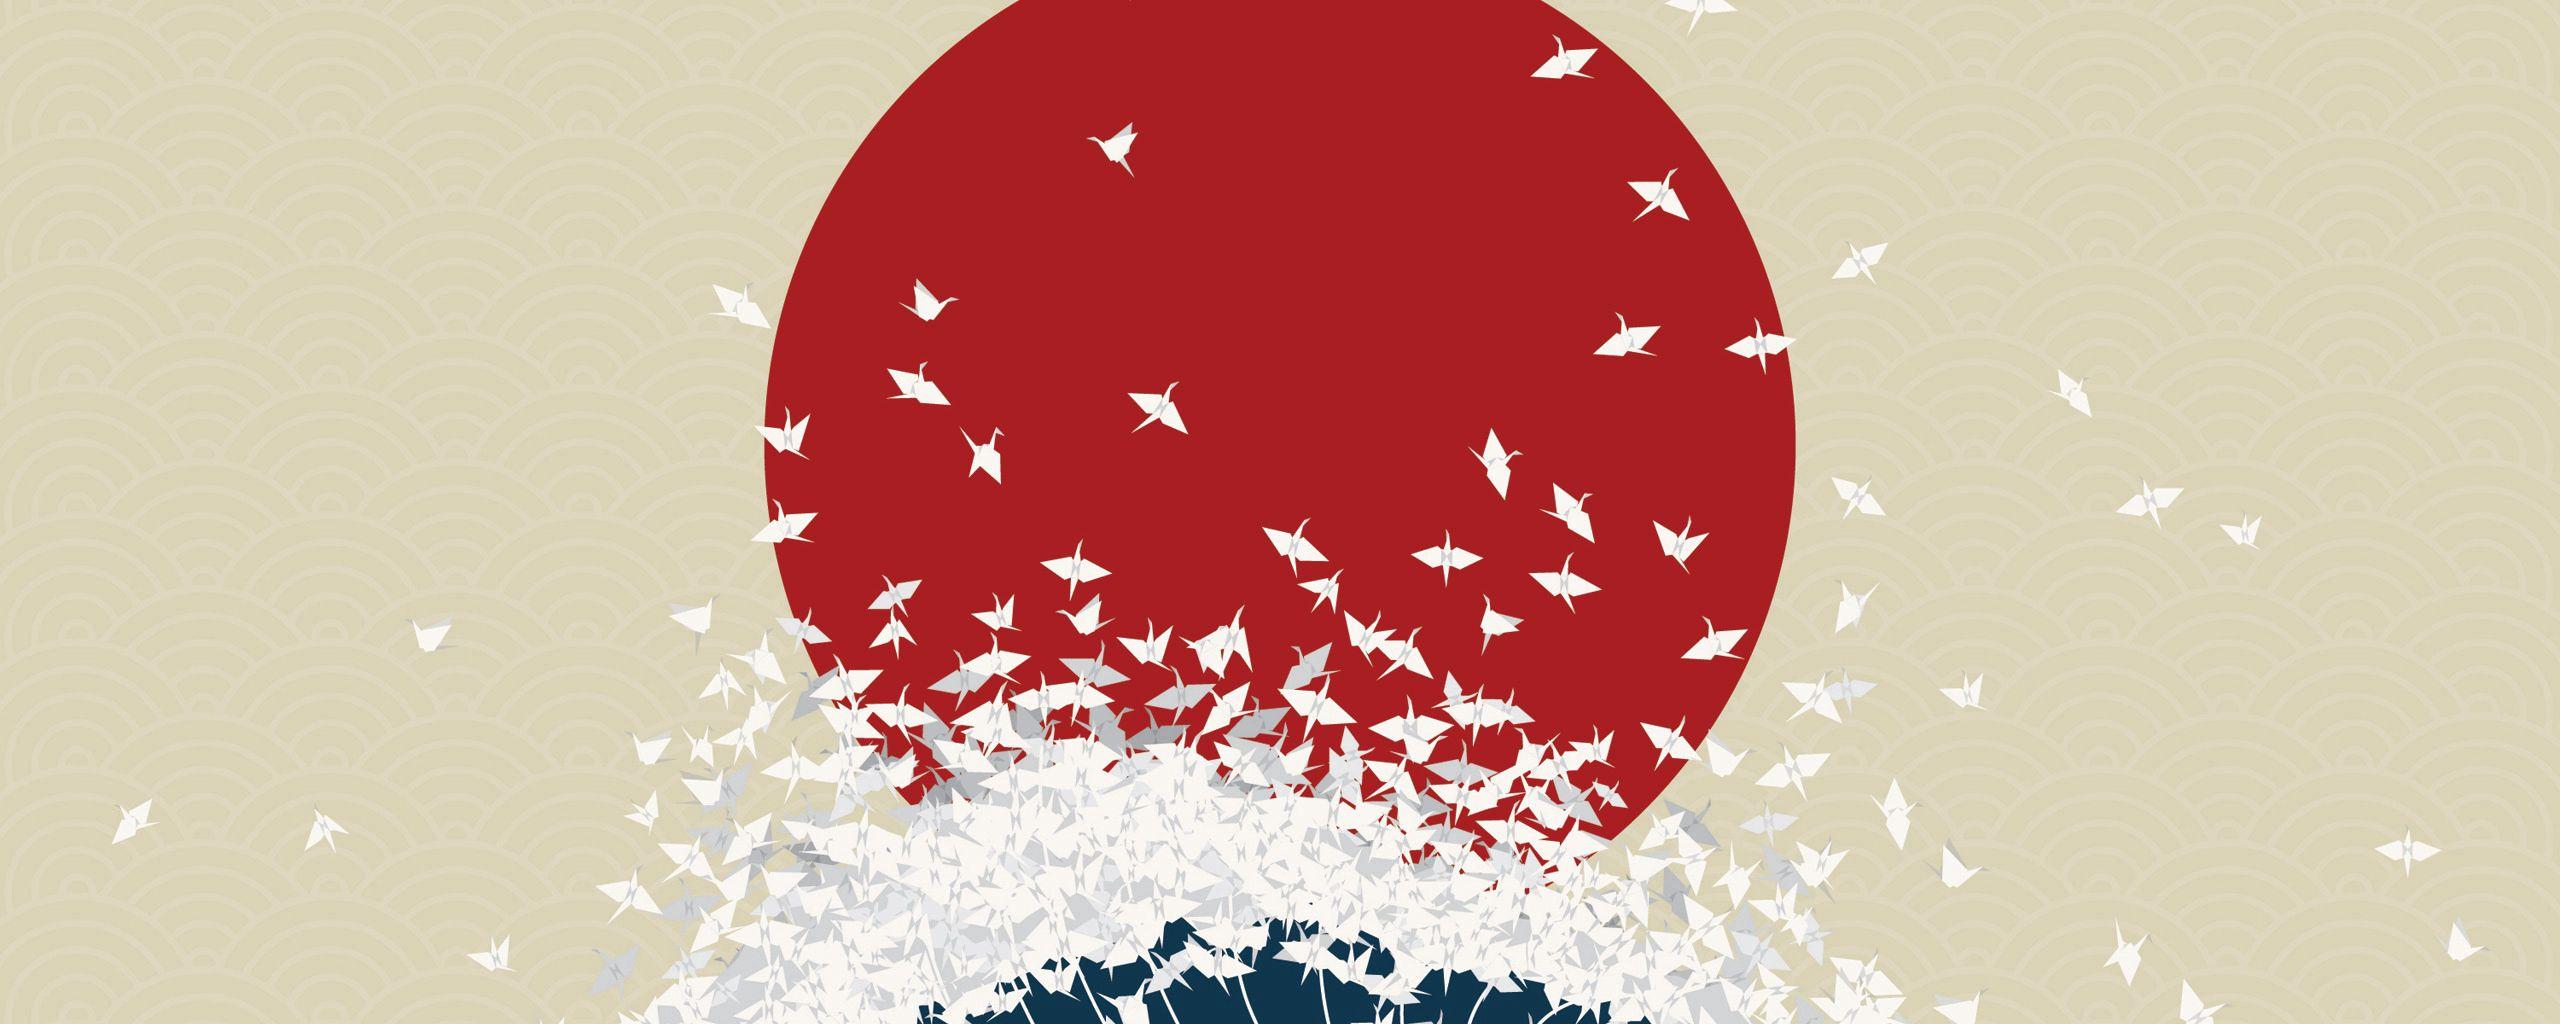 2560x1024 Wallpaper minimalism, origami, japan, rising sun, wave